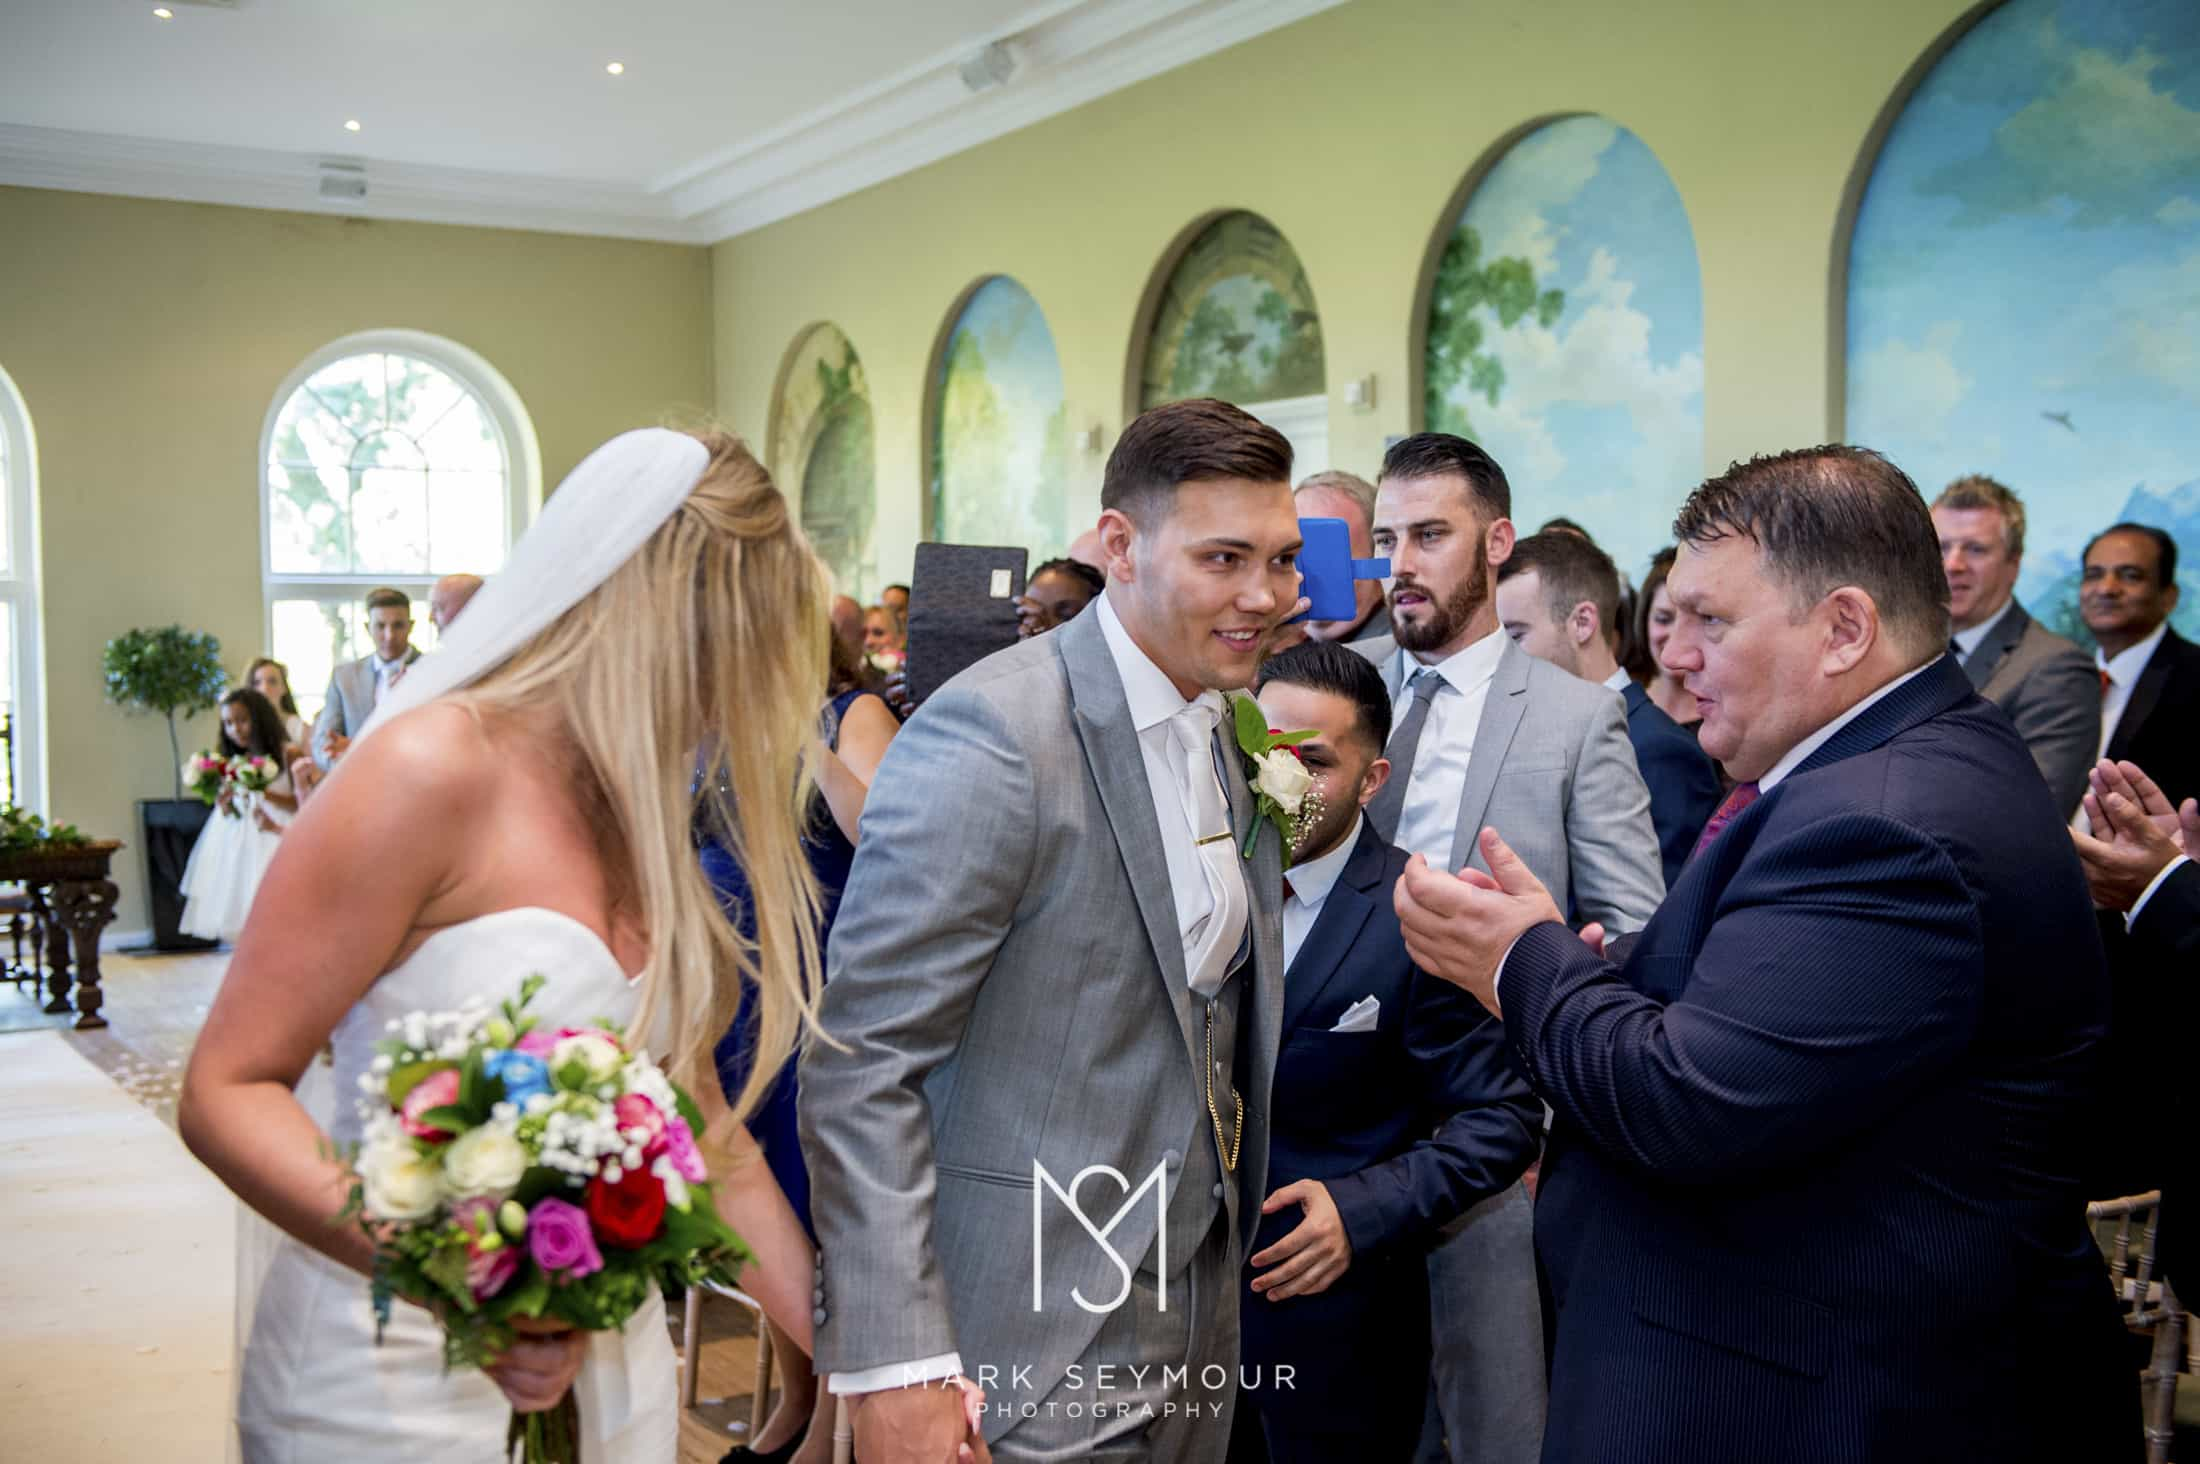 Braxted Park wedding photography 24